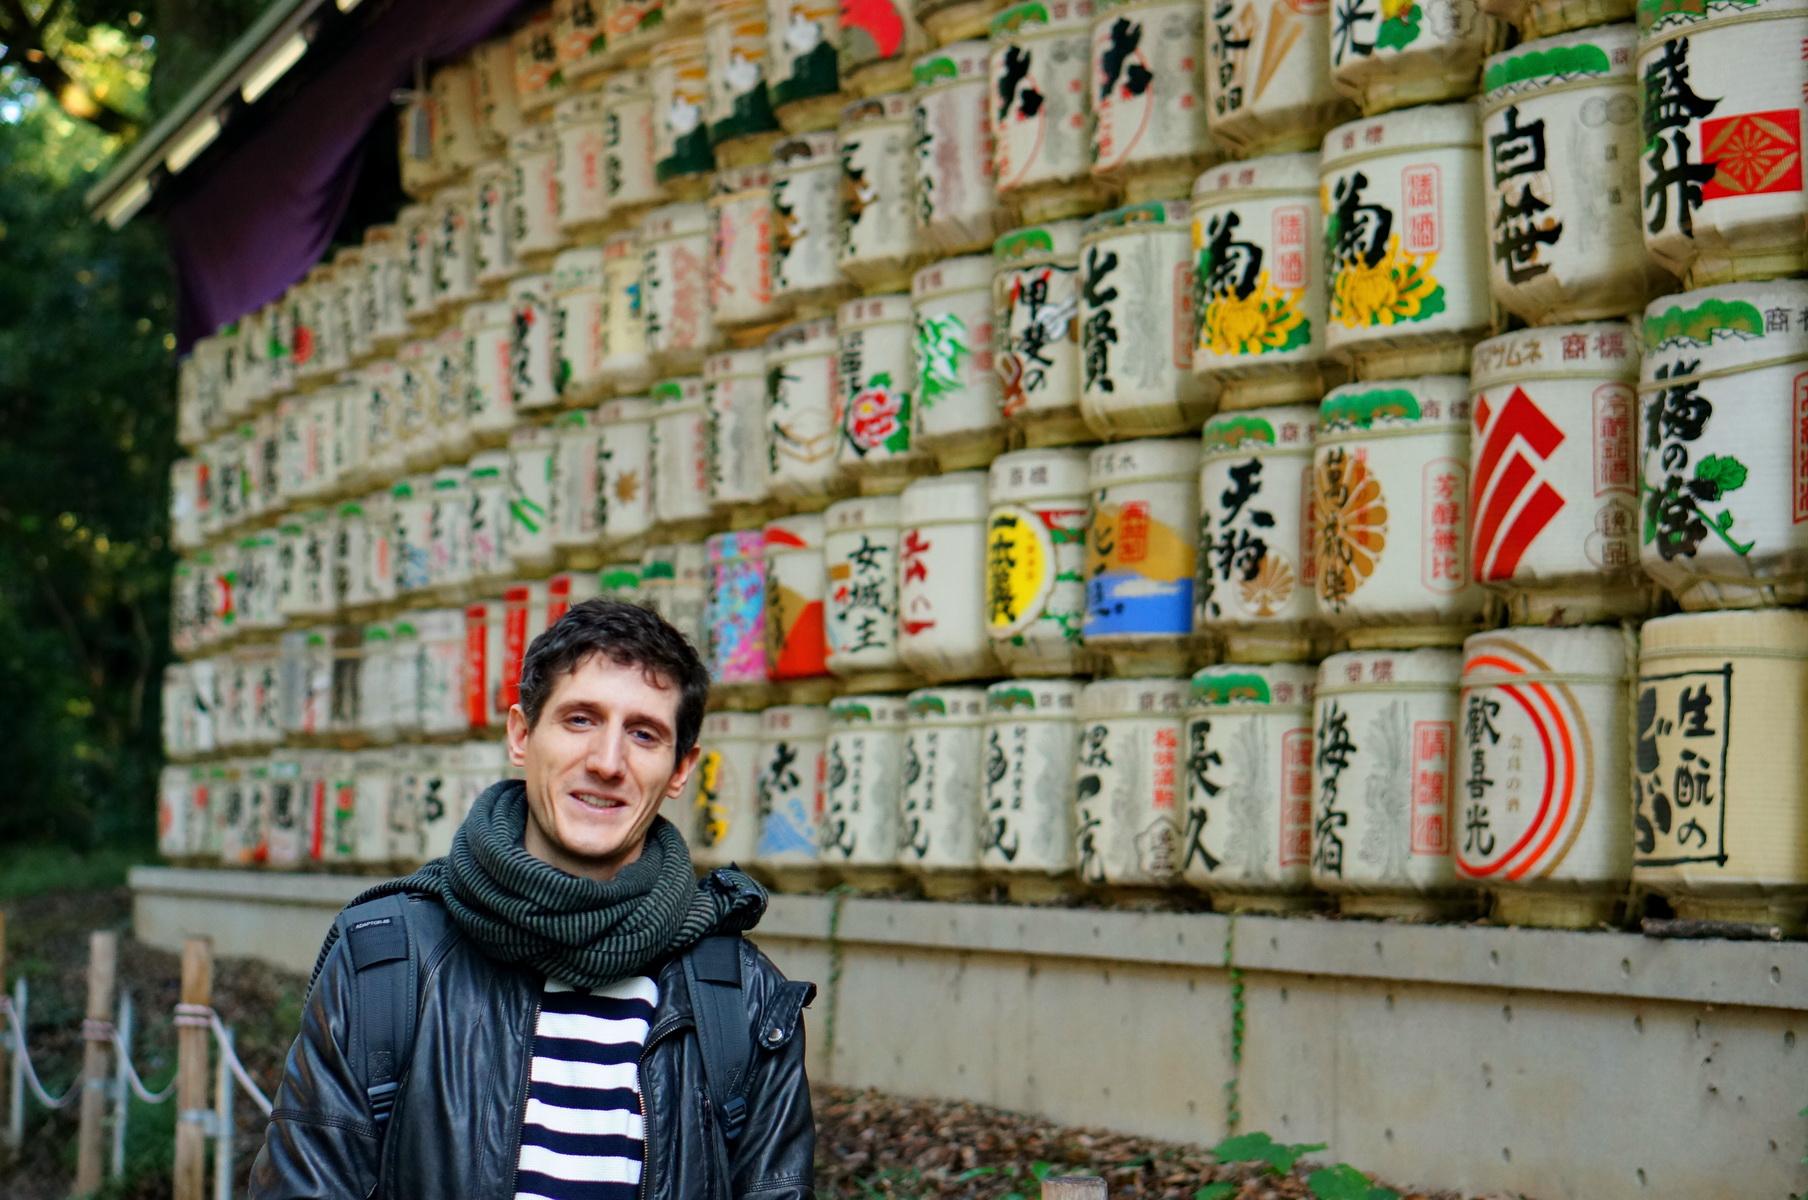 meiji-jingu, yoyogi, tokyo city guide, tokyo, japan trip, voyage au japon, sancture meiju-jingu